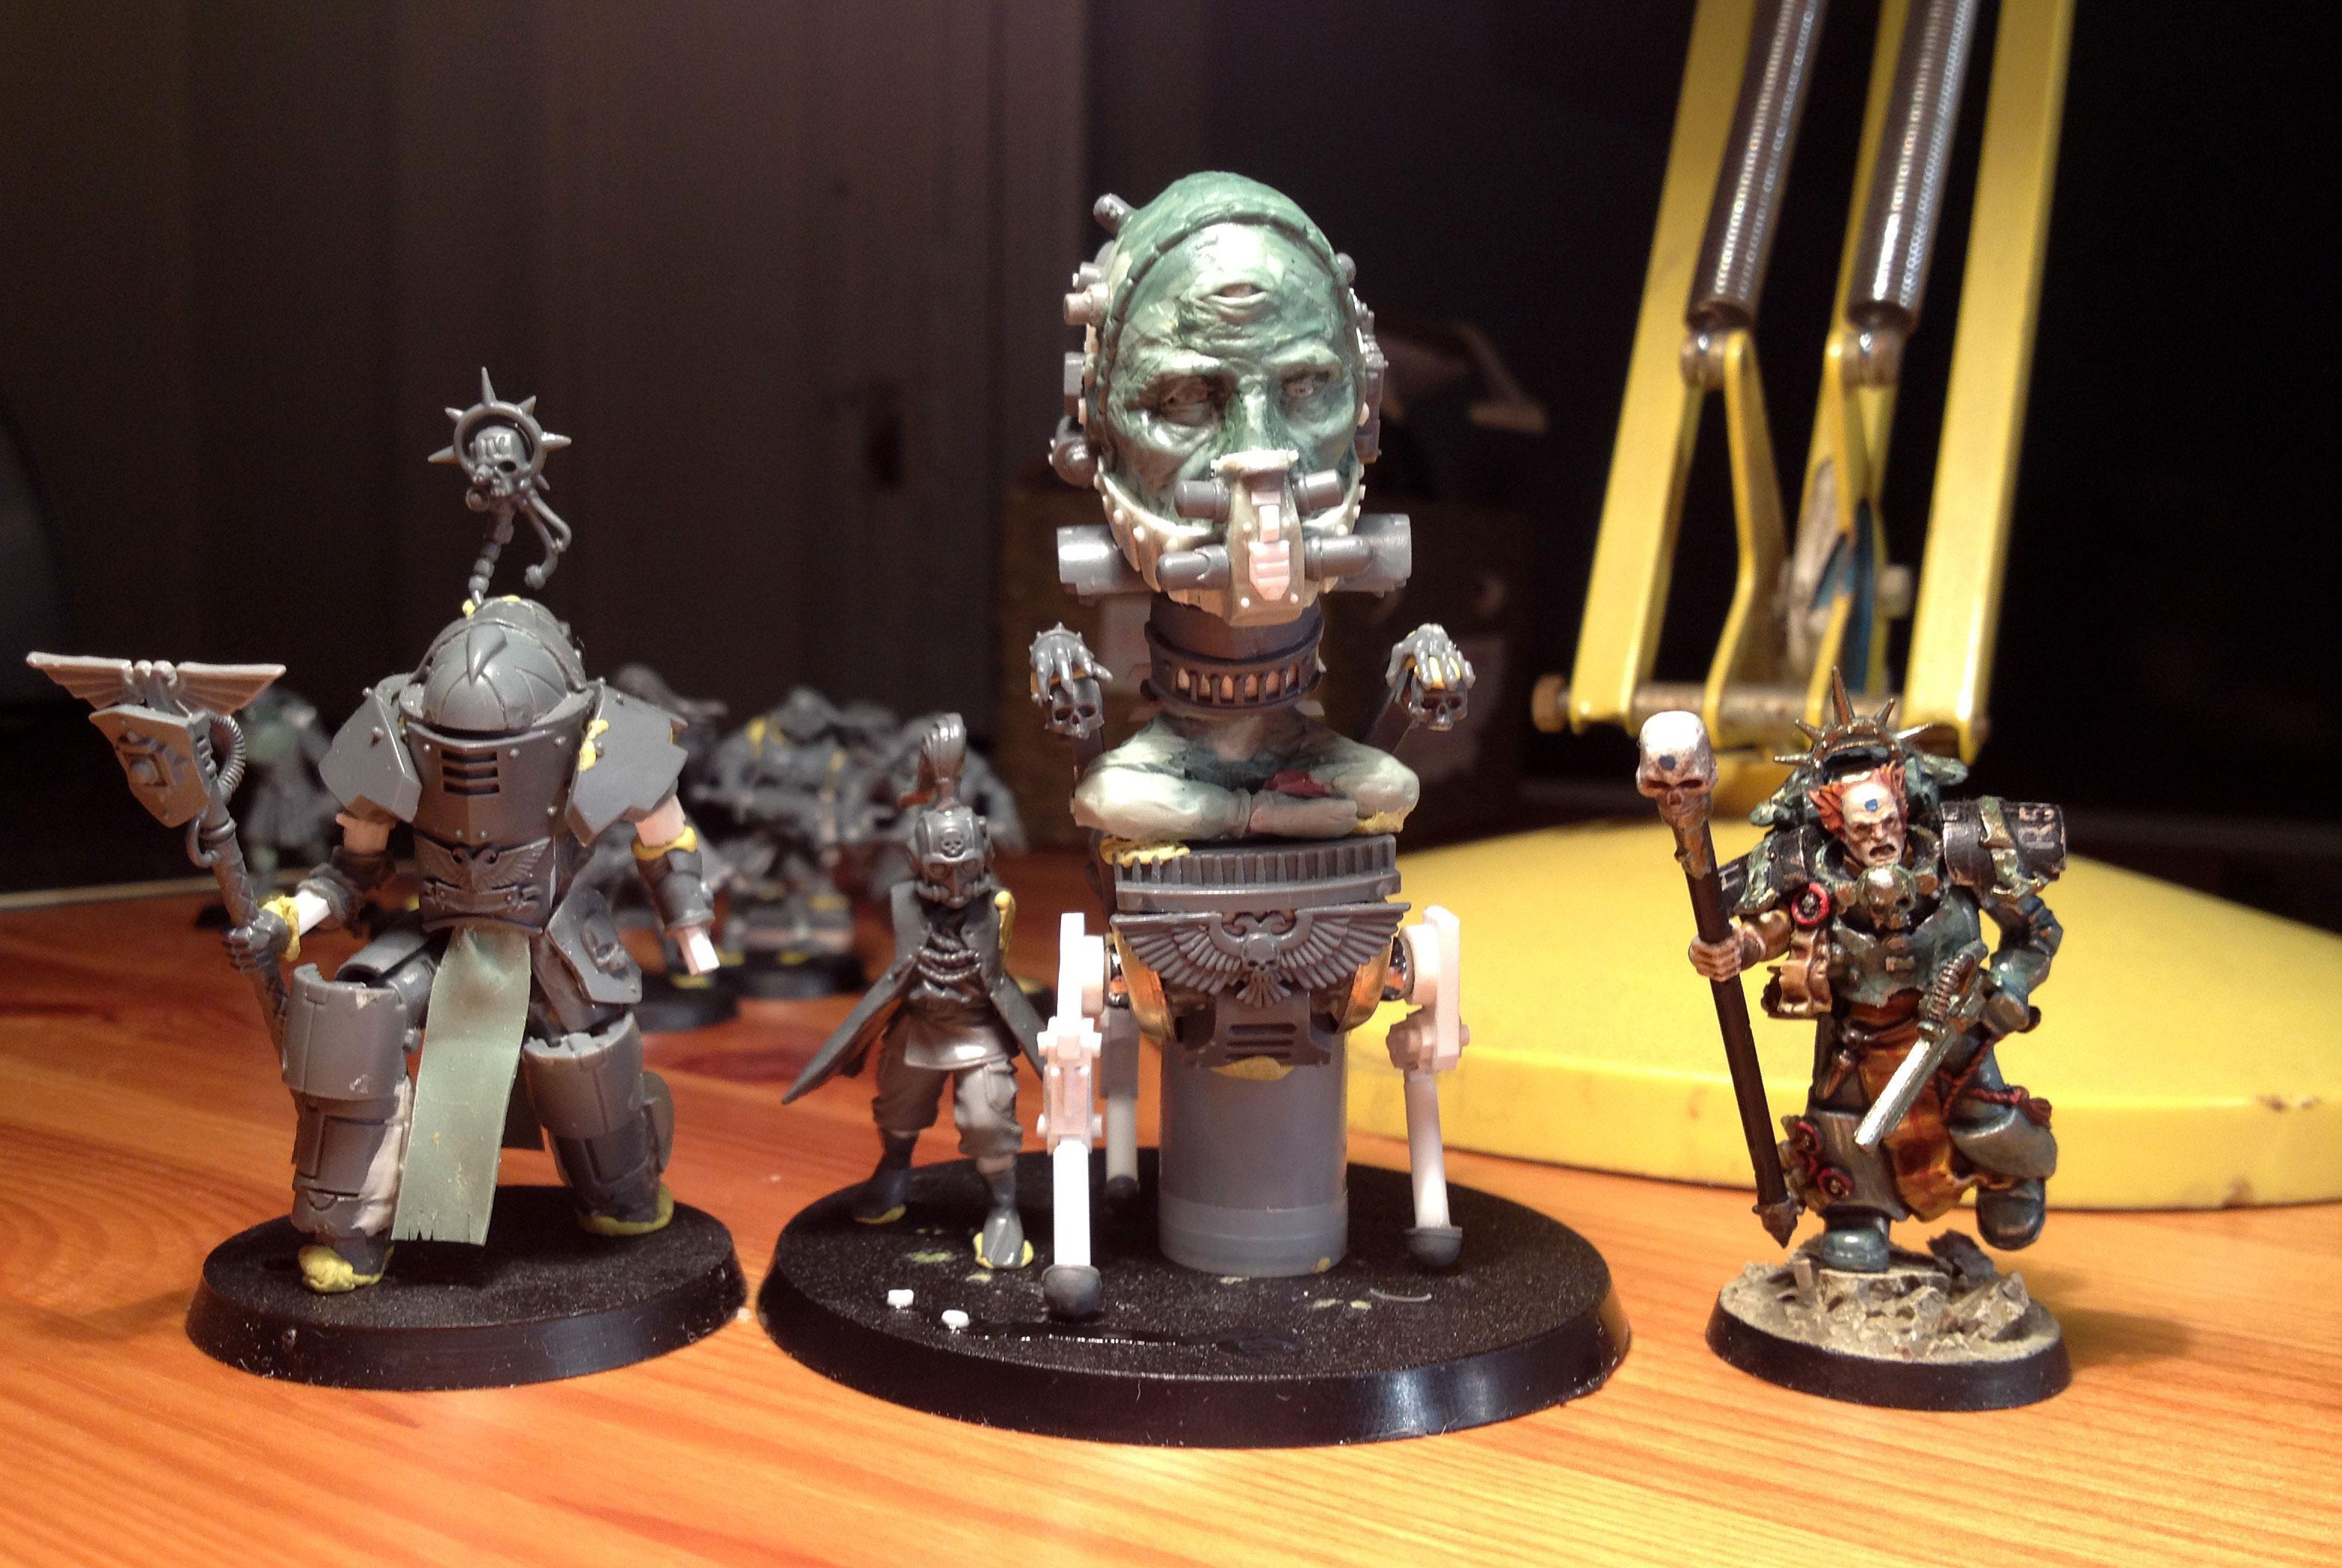 Greenstuff, Karamazov, Navigator, Robot, Scratch Build, Sculpting